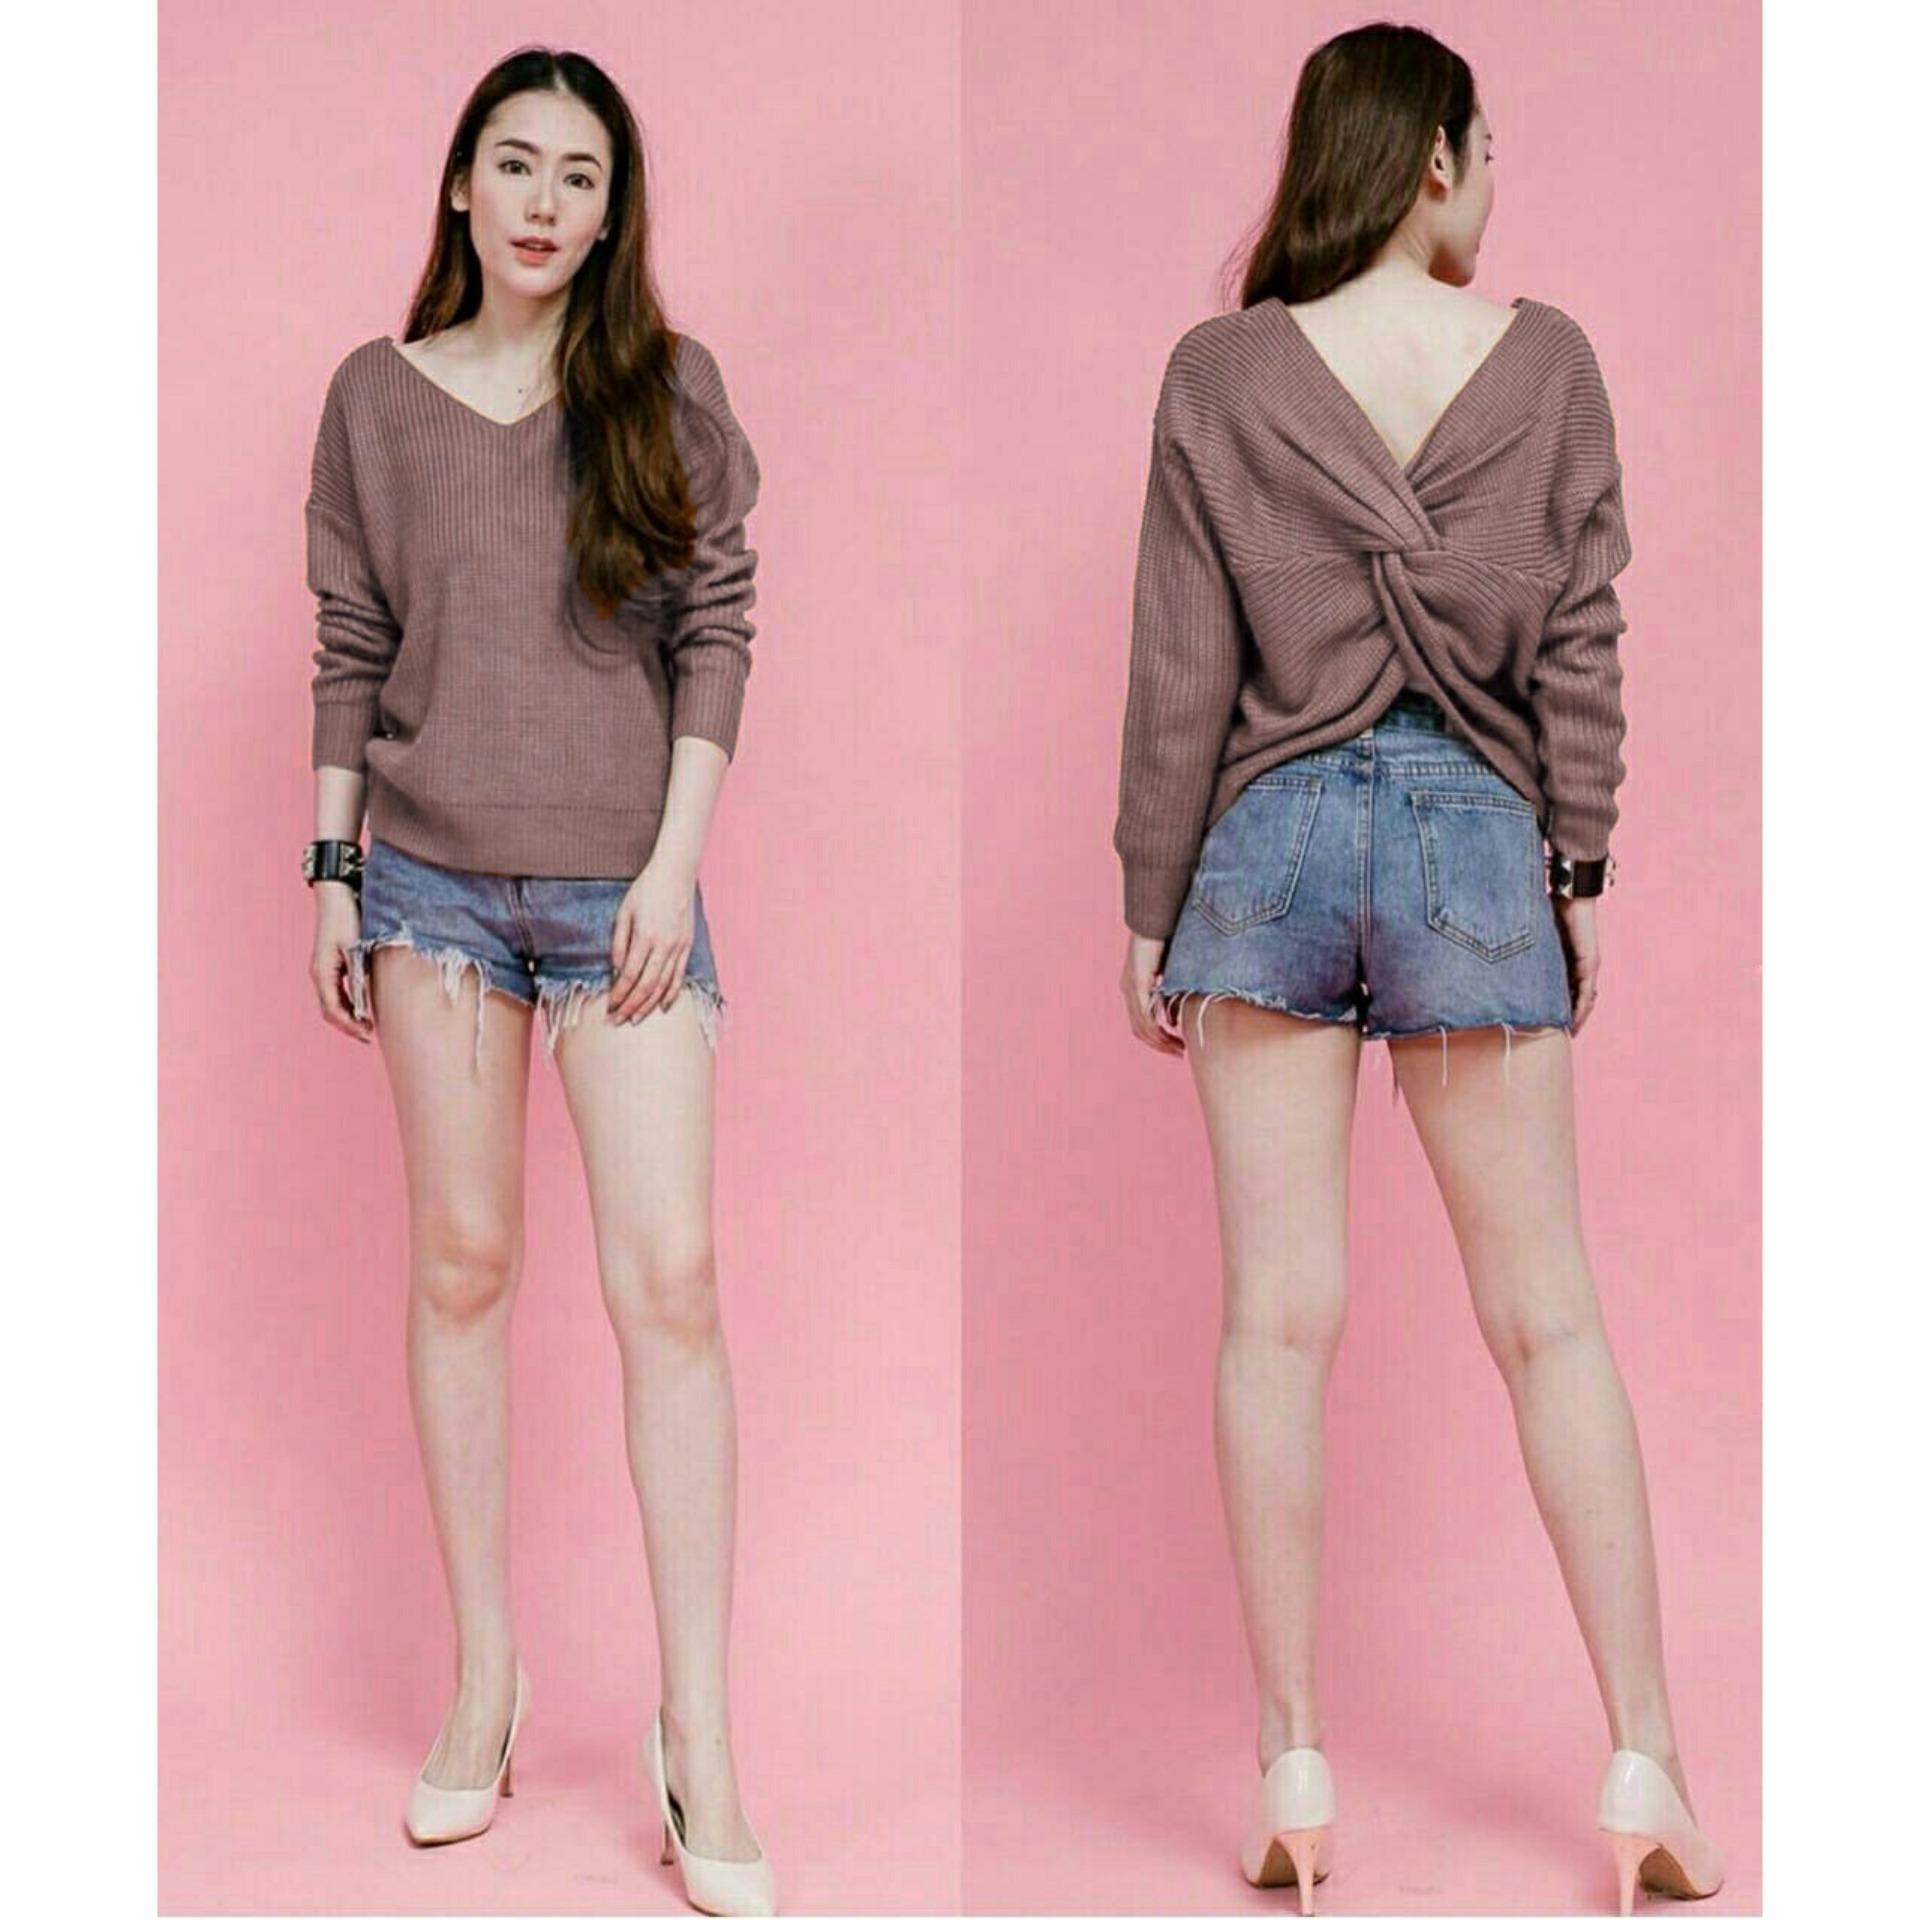 koreafancystore / dusty tamani blouse / baju lengan panjang / pakaian wanita / kado ulang tahun